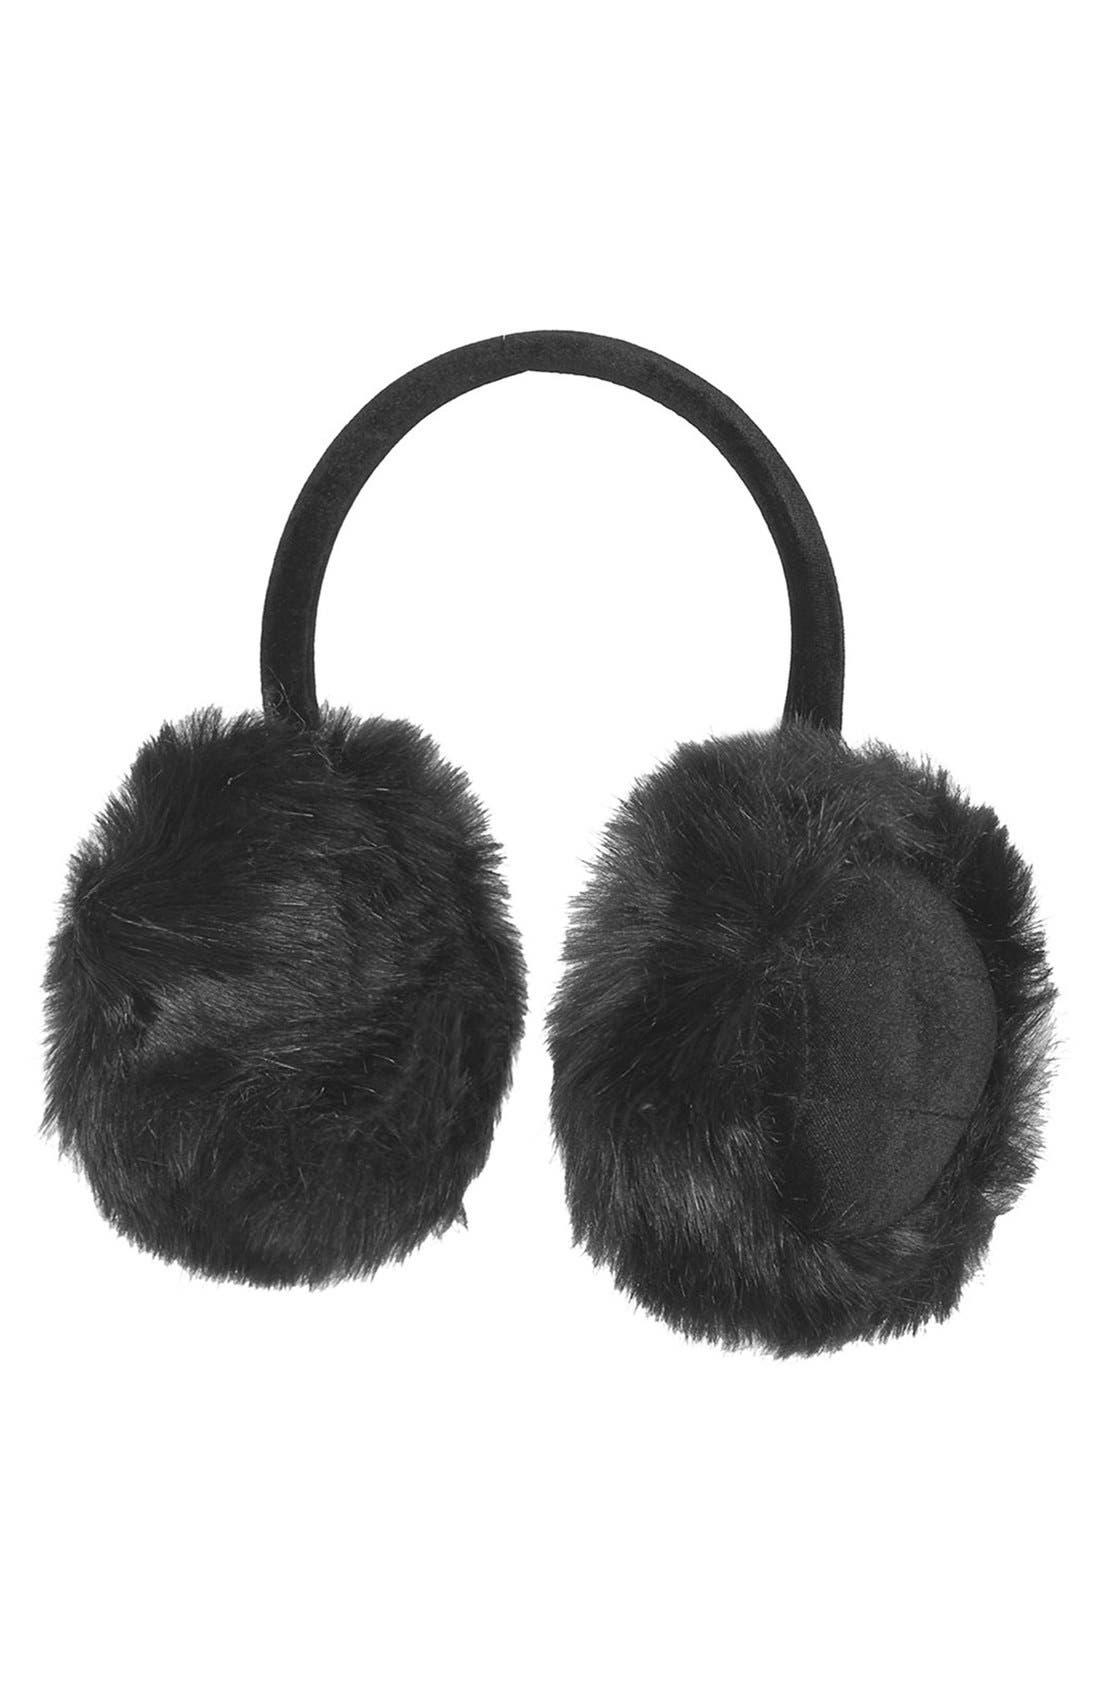 TOPSHOP, 'Core' Faux Fur Earmuffs, Main thumbnail 1, color, 001